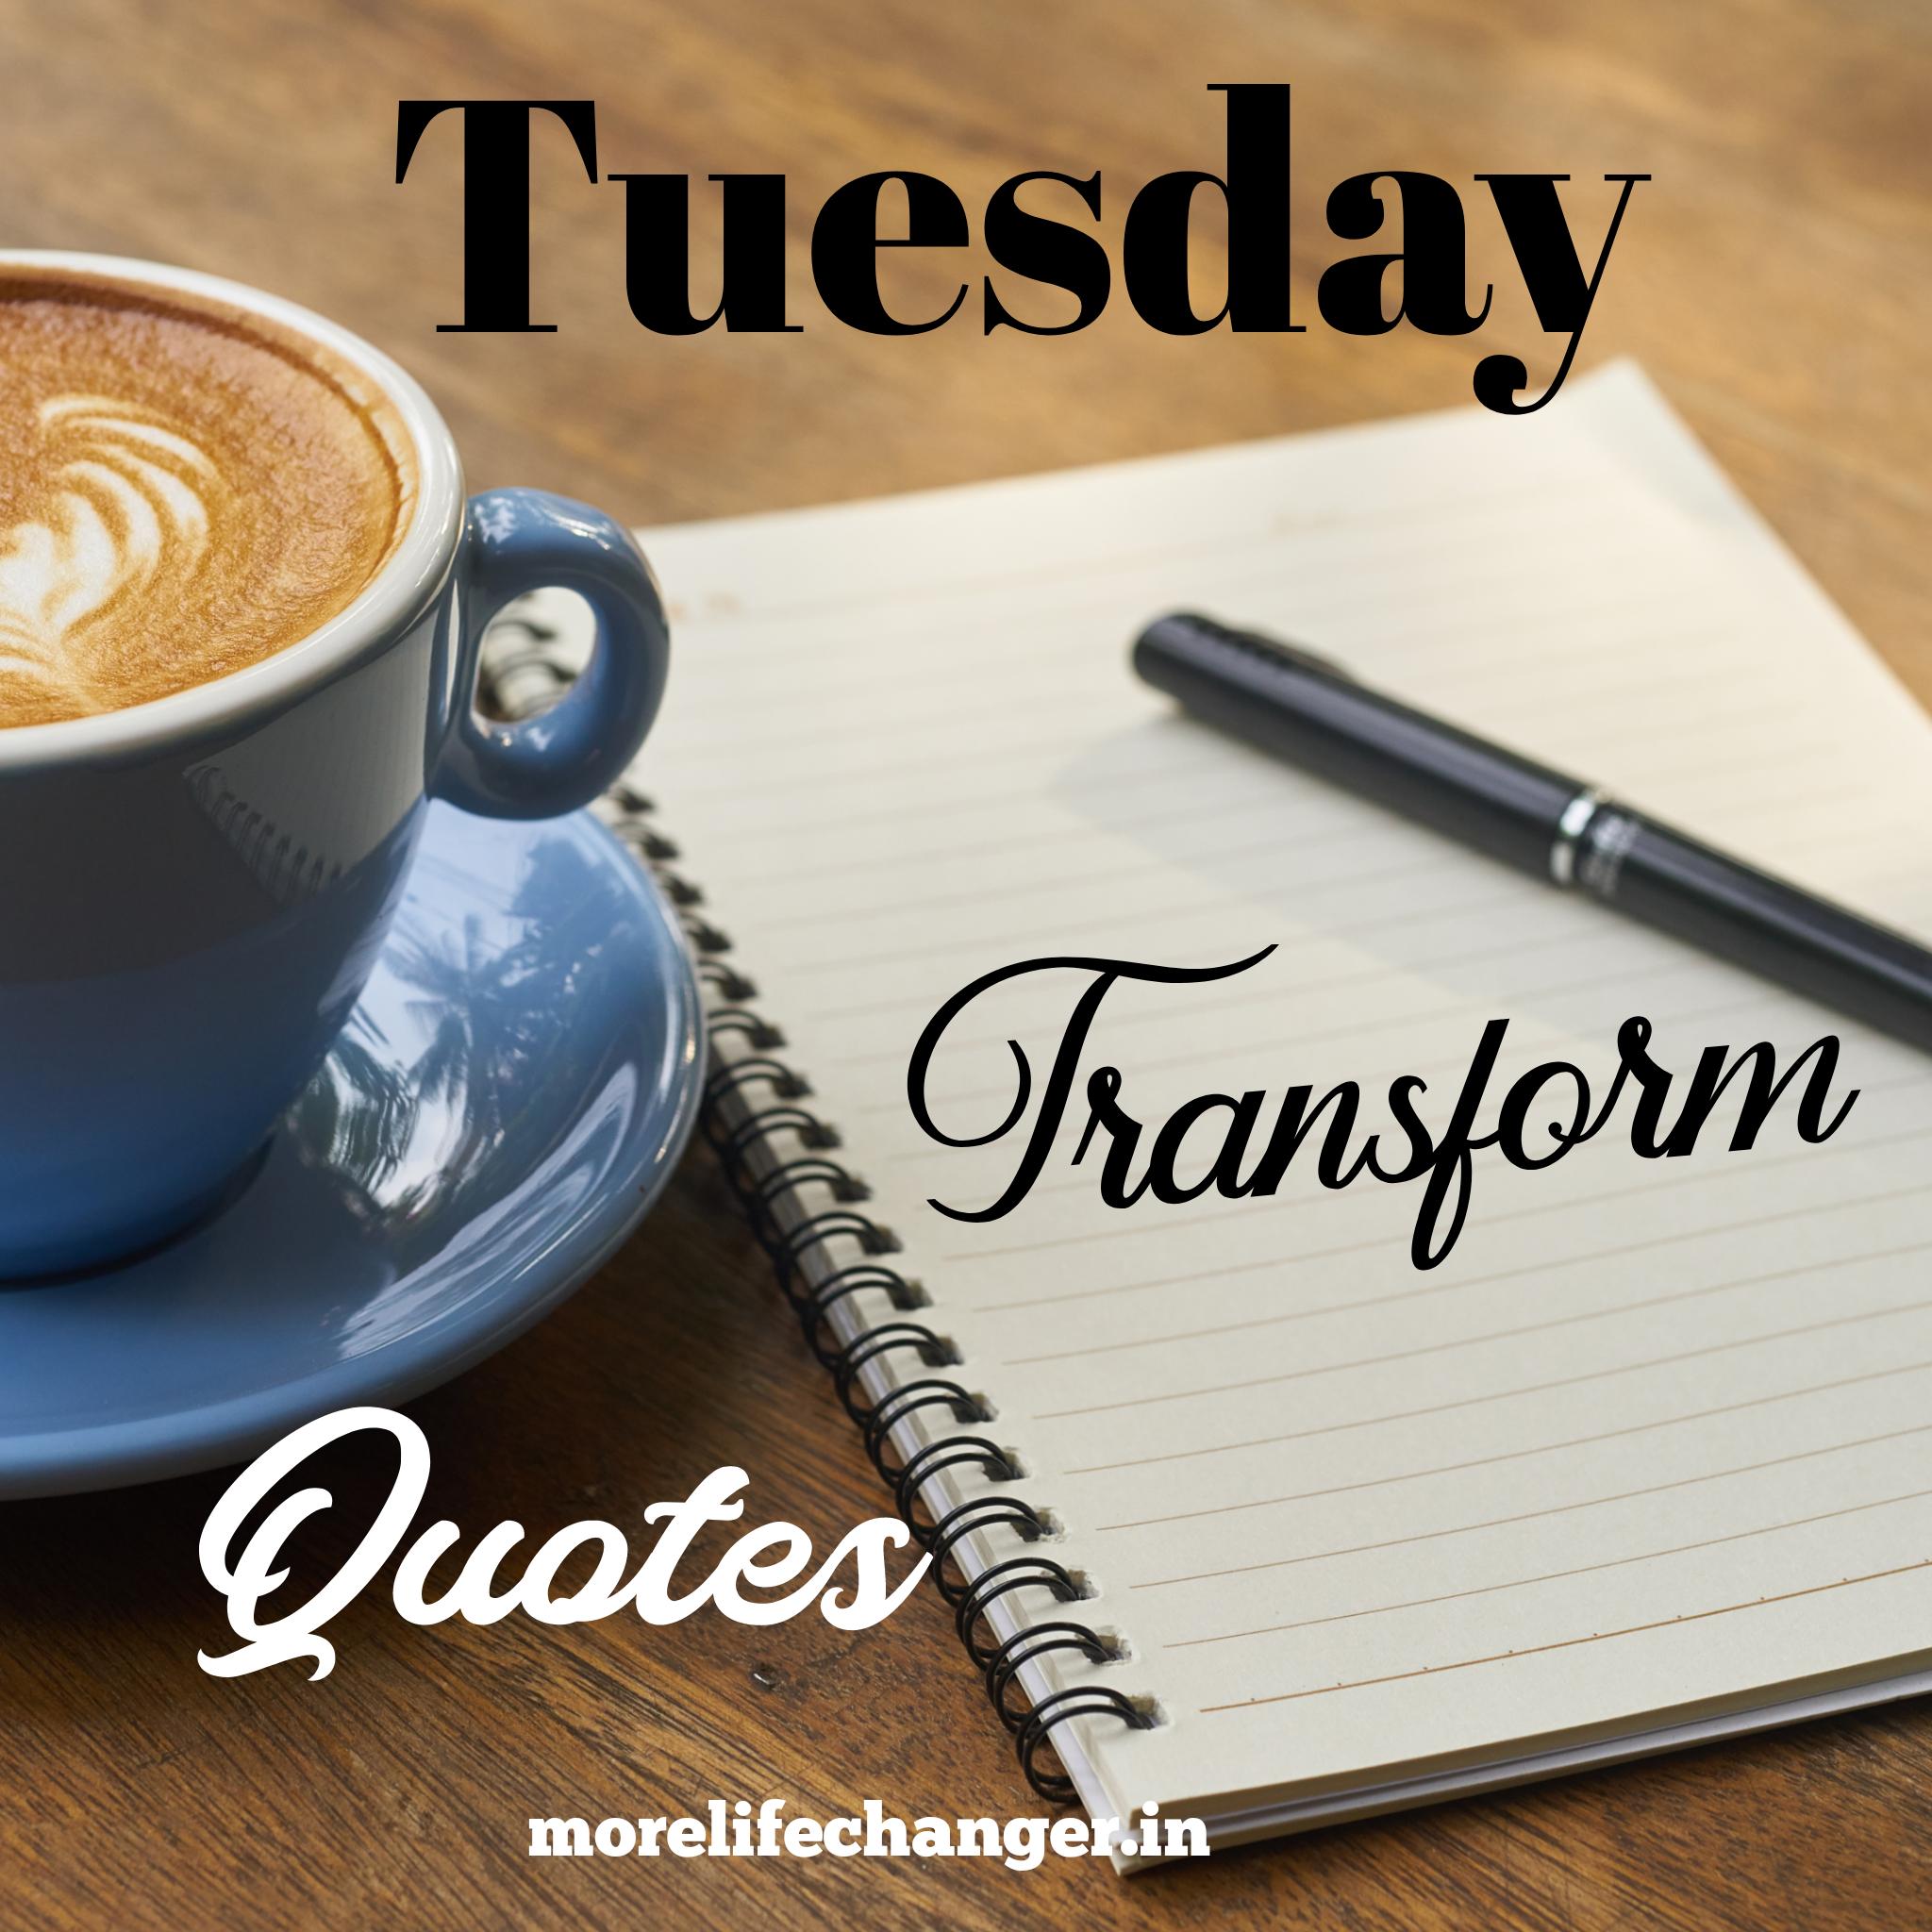 Tuesday transform quotes